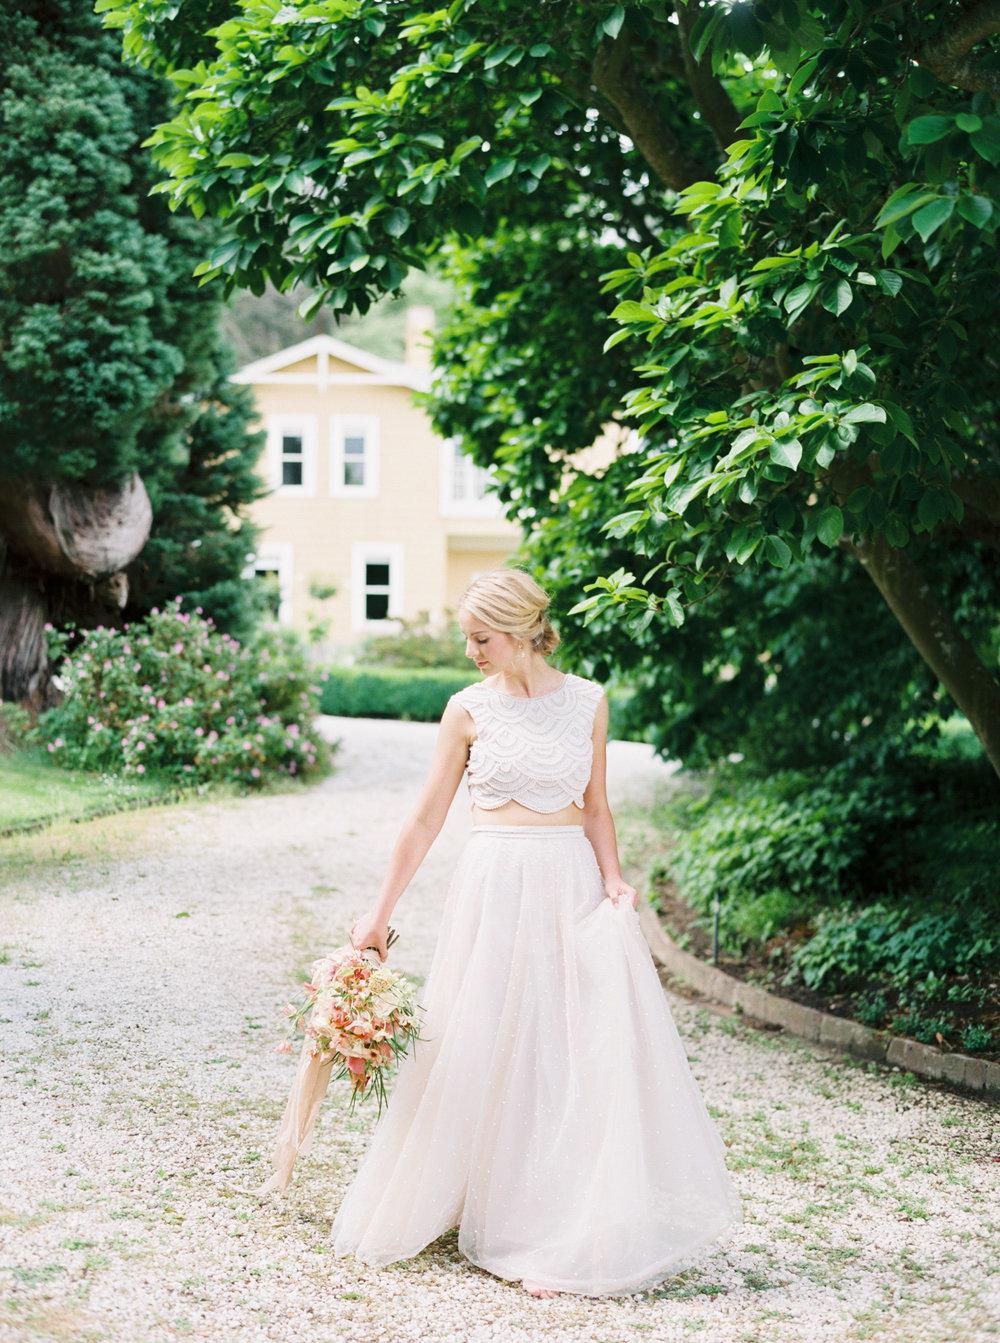 Timeless Southern Highland Wedding Elopement in Bowral NSW Fine Art Film Photographer Sheri McMahon-29.jpg